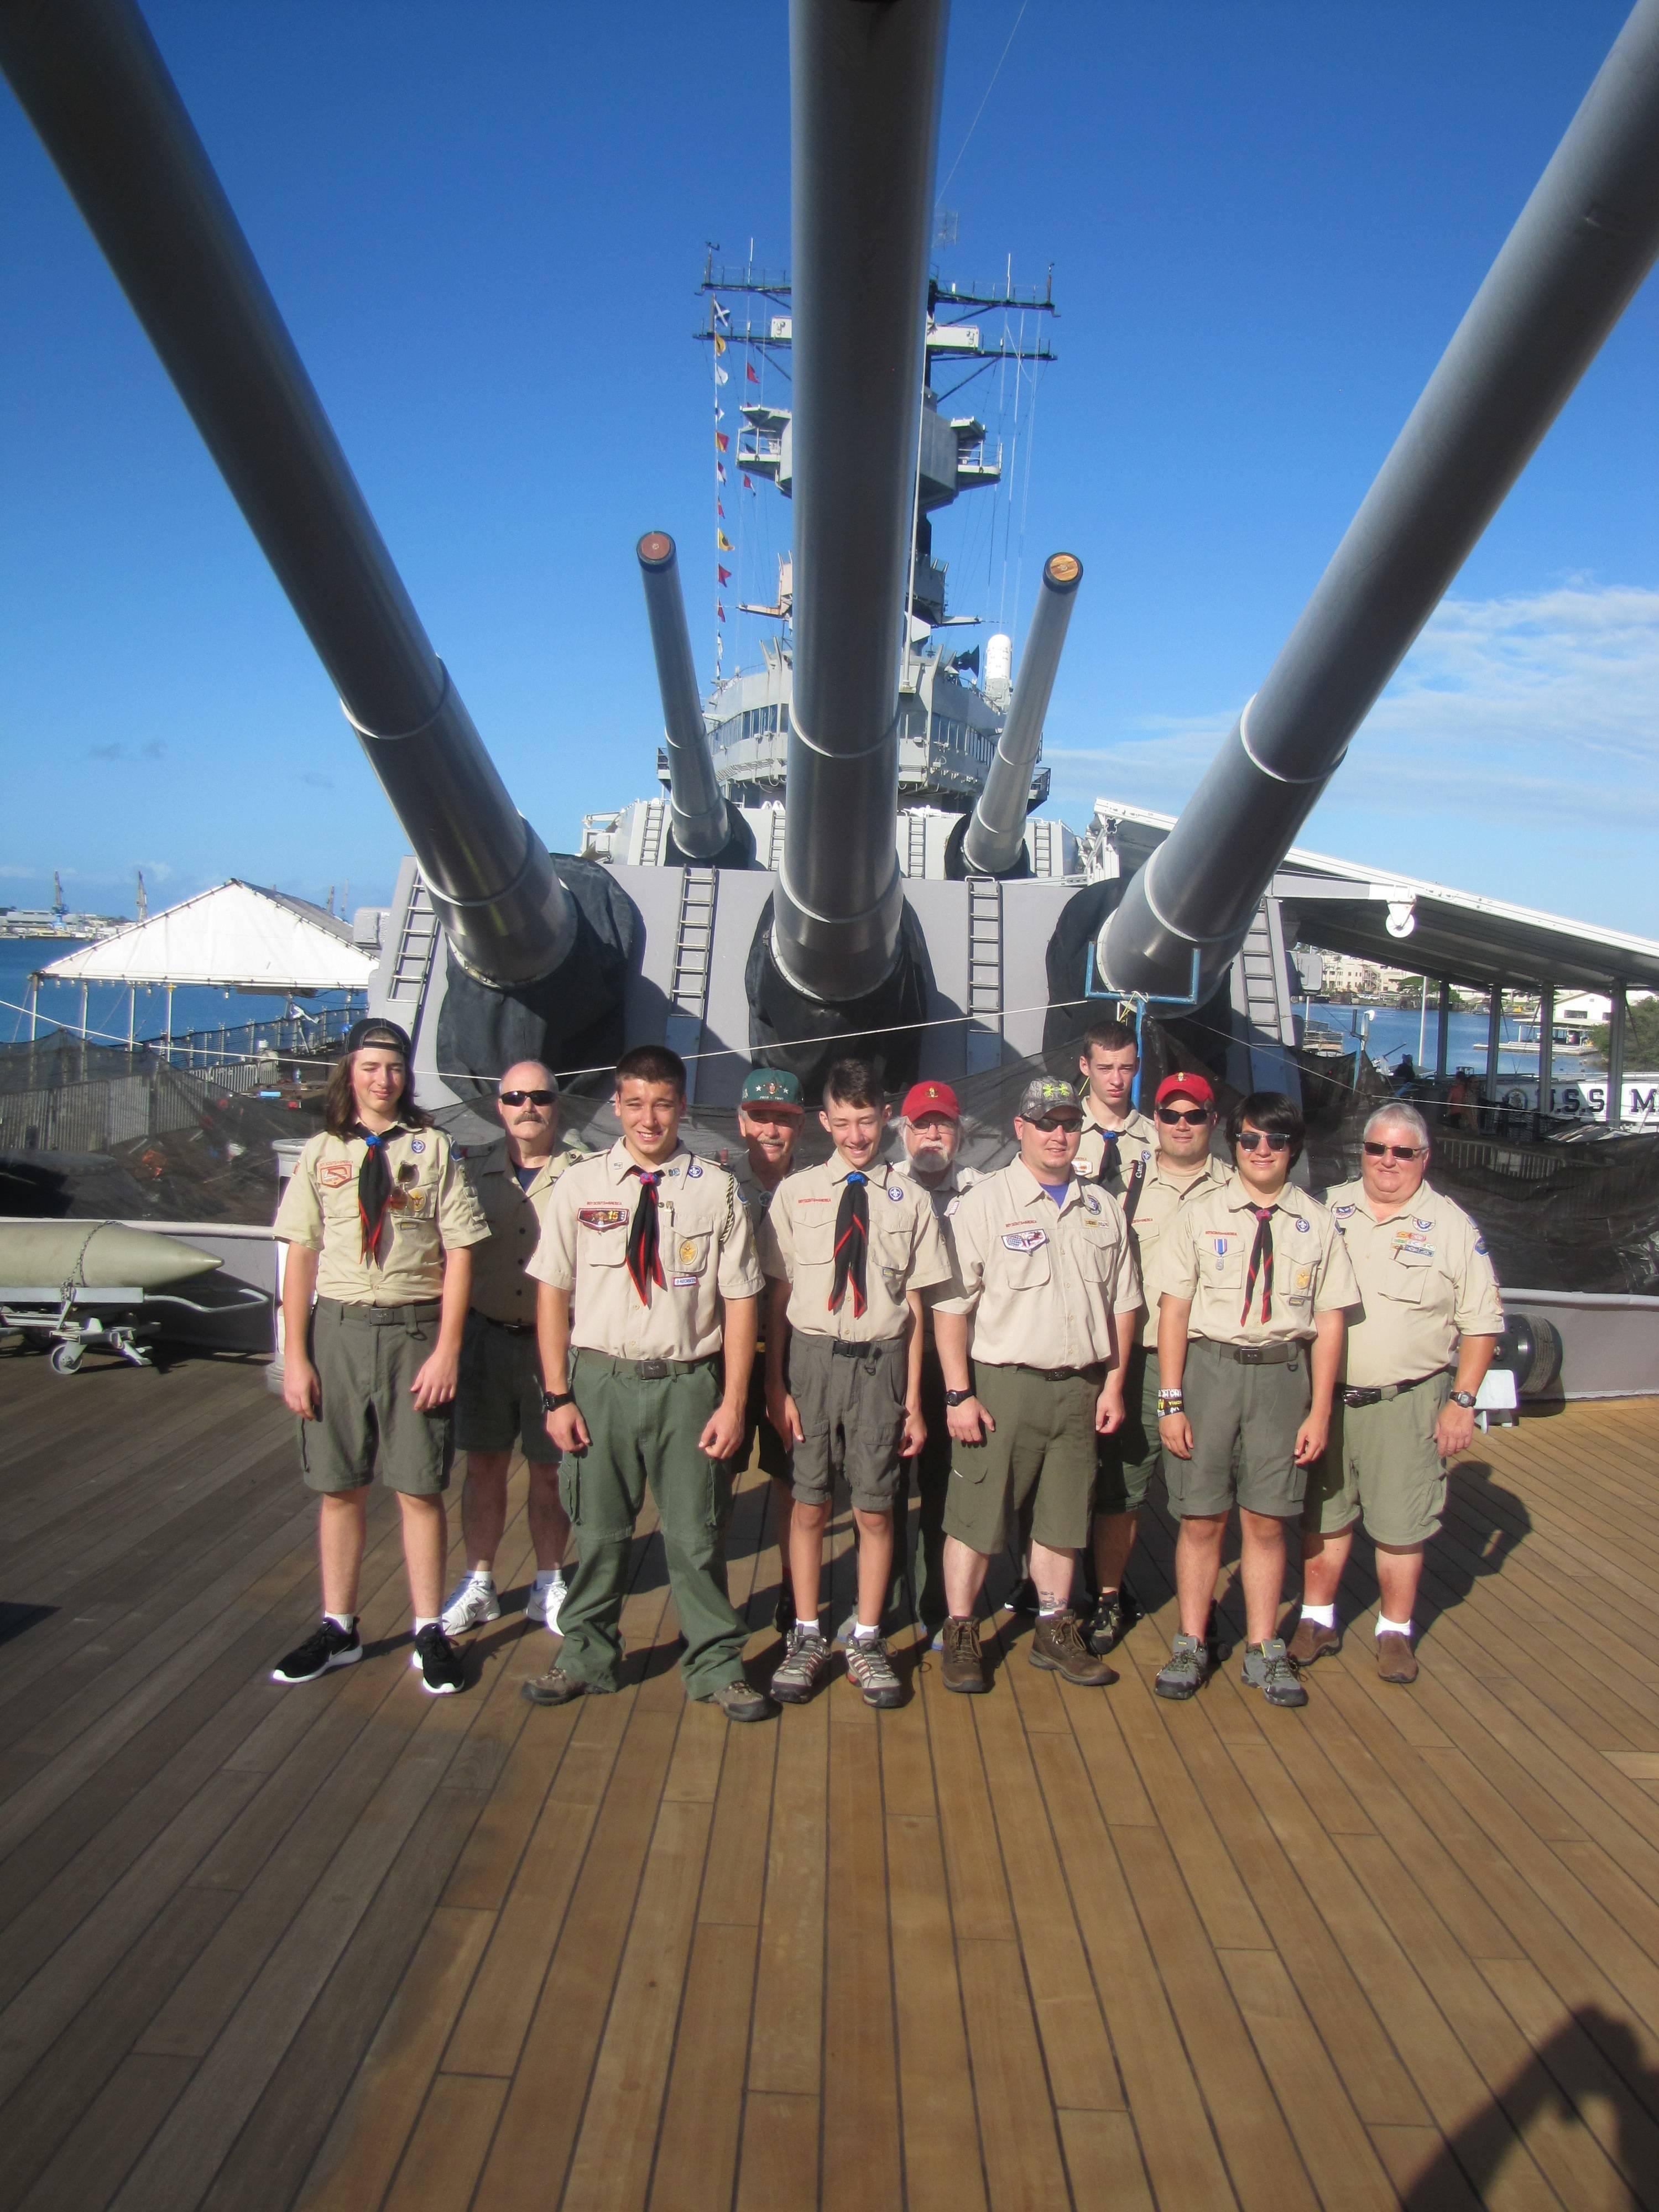 f543c6c9c5e4e02cdf1b_scouts_-_USS_Missouri.JPG